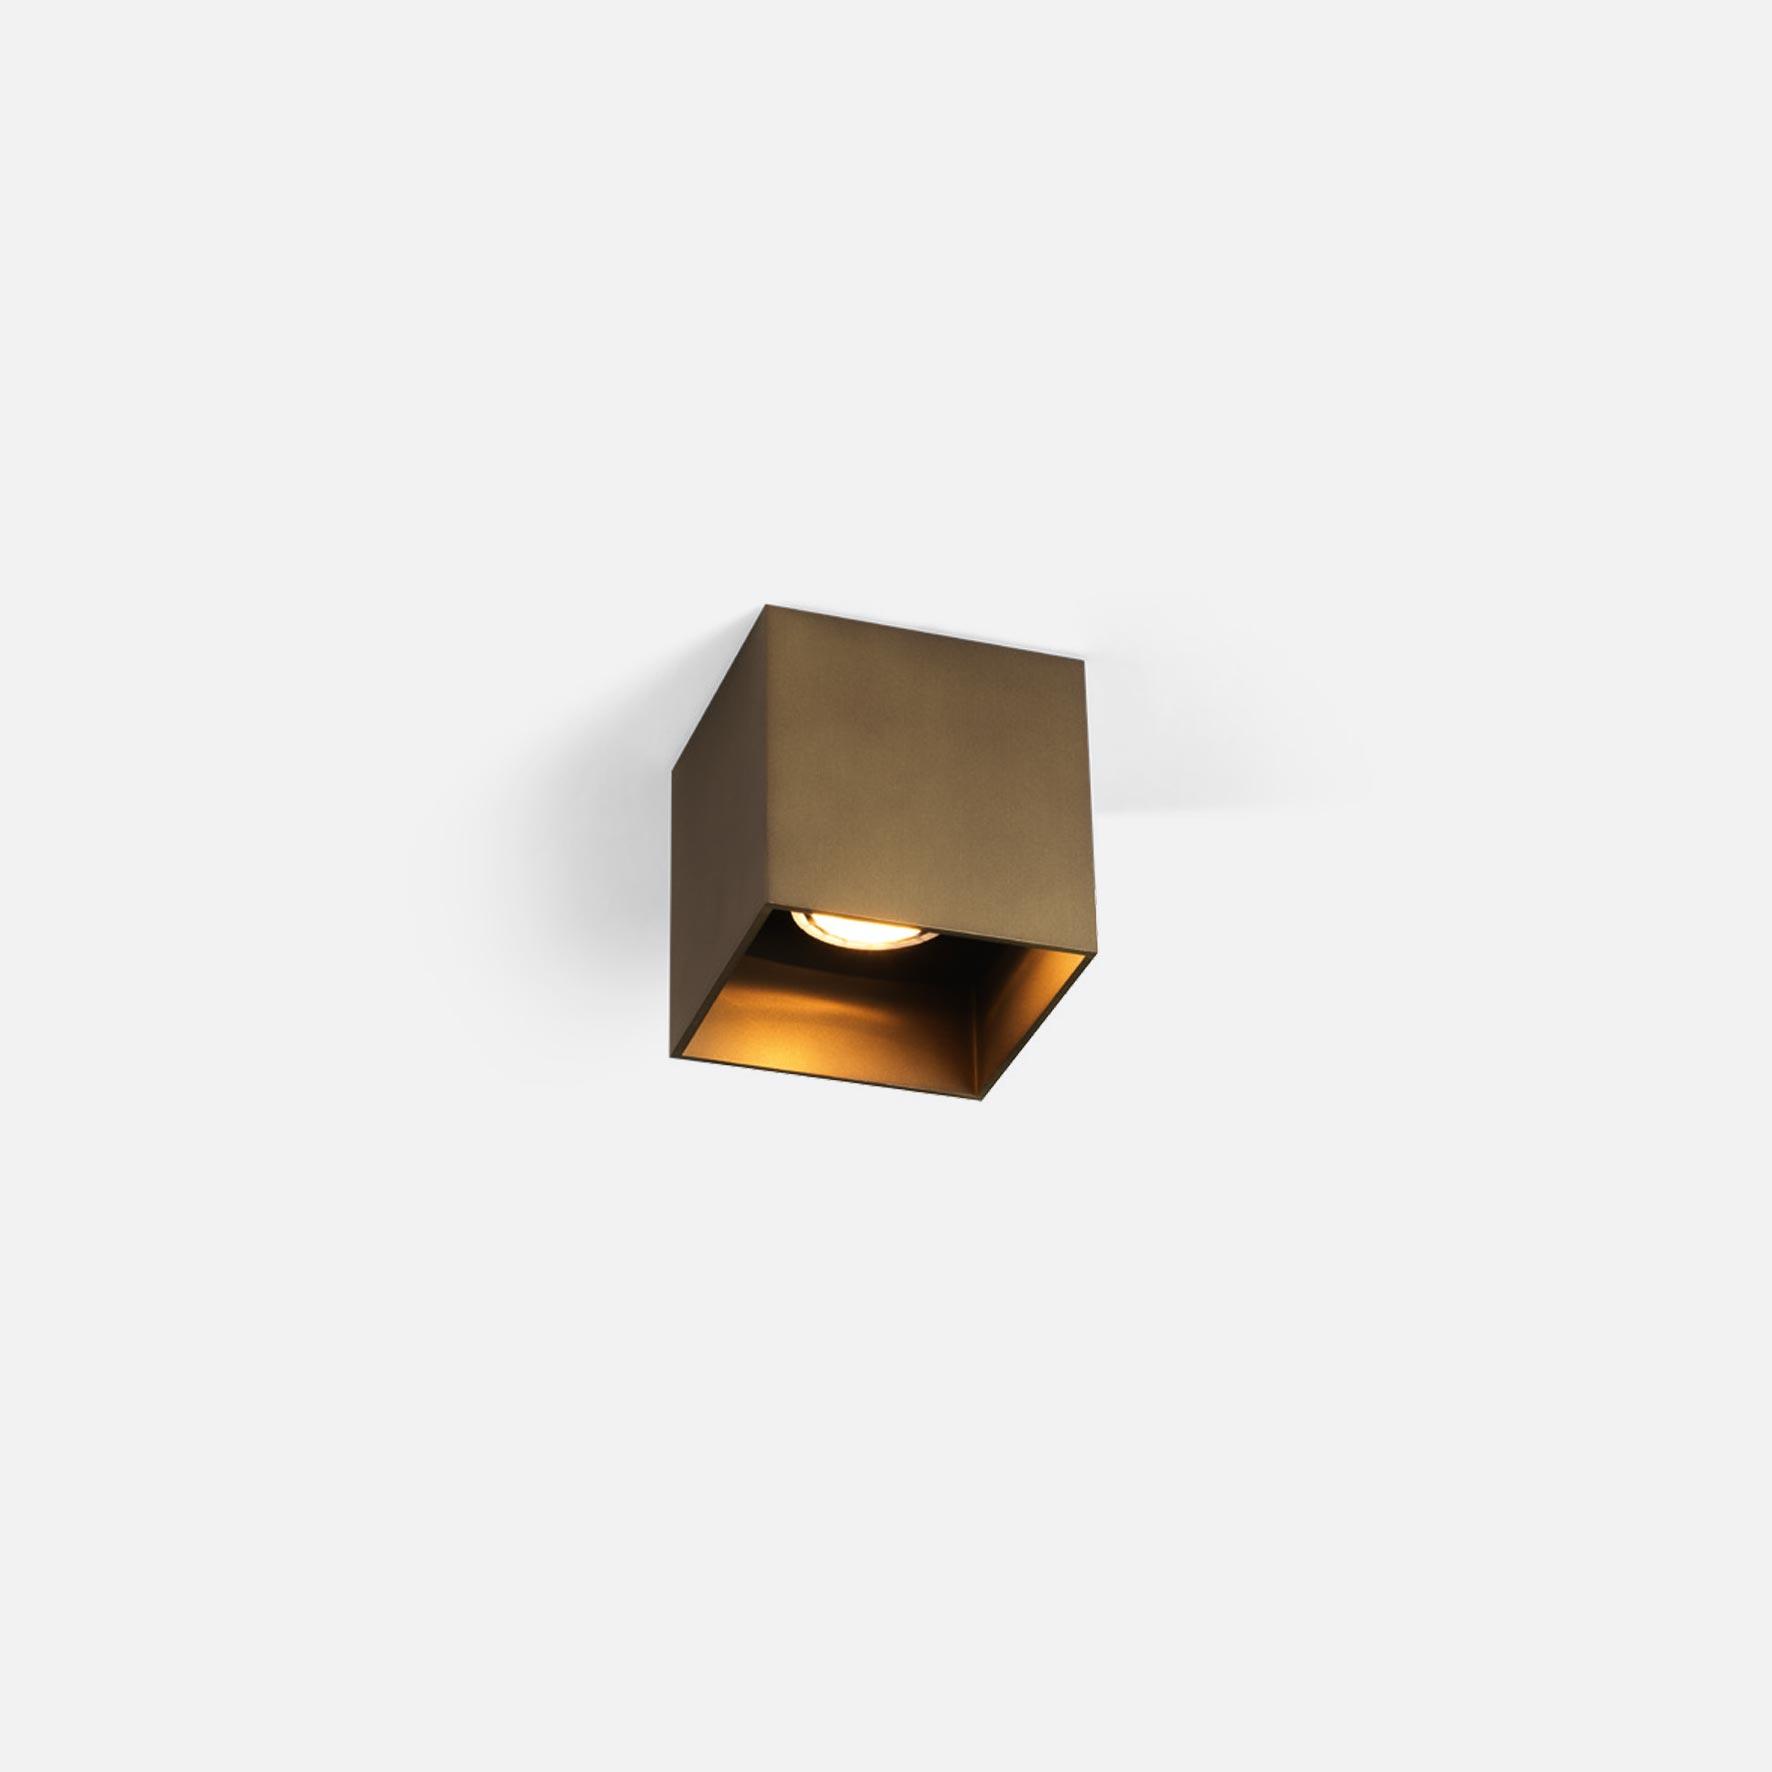 Box 1.0 led bronze 1800 2850k